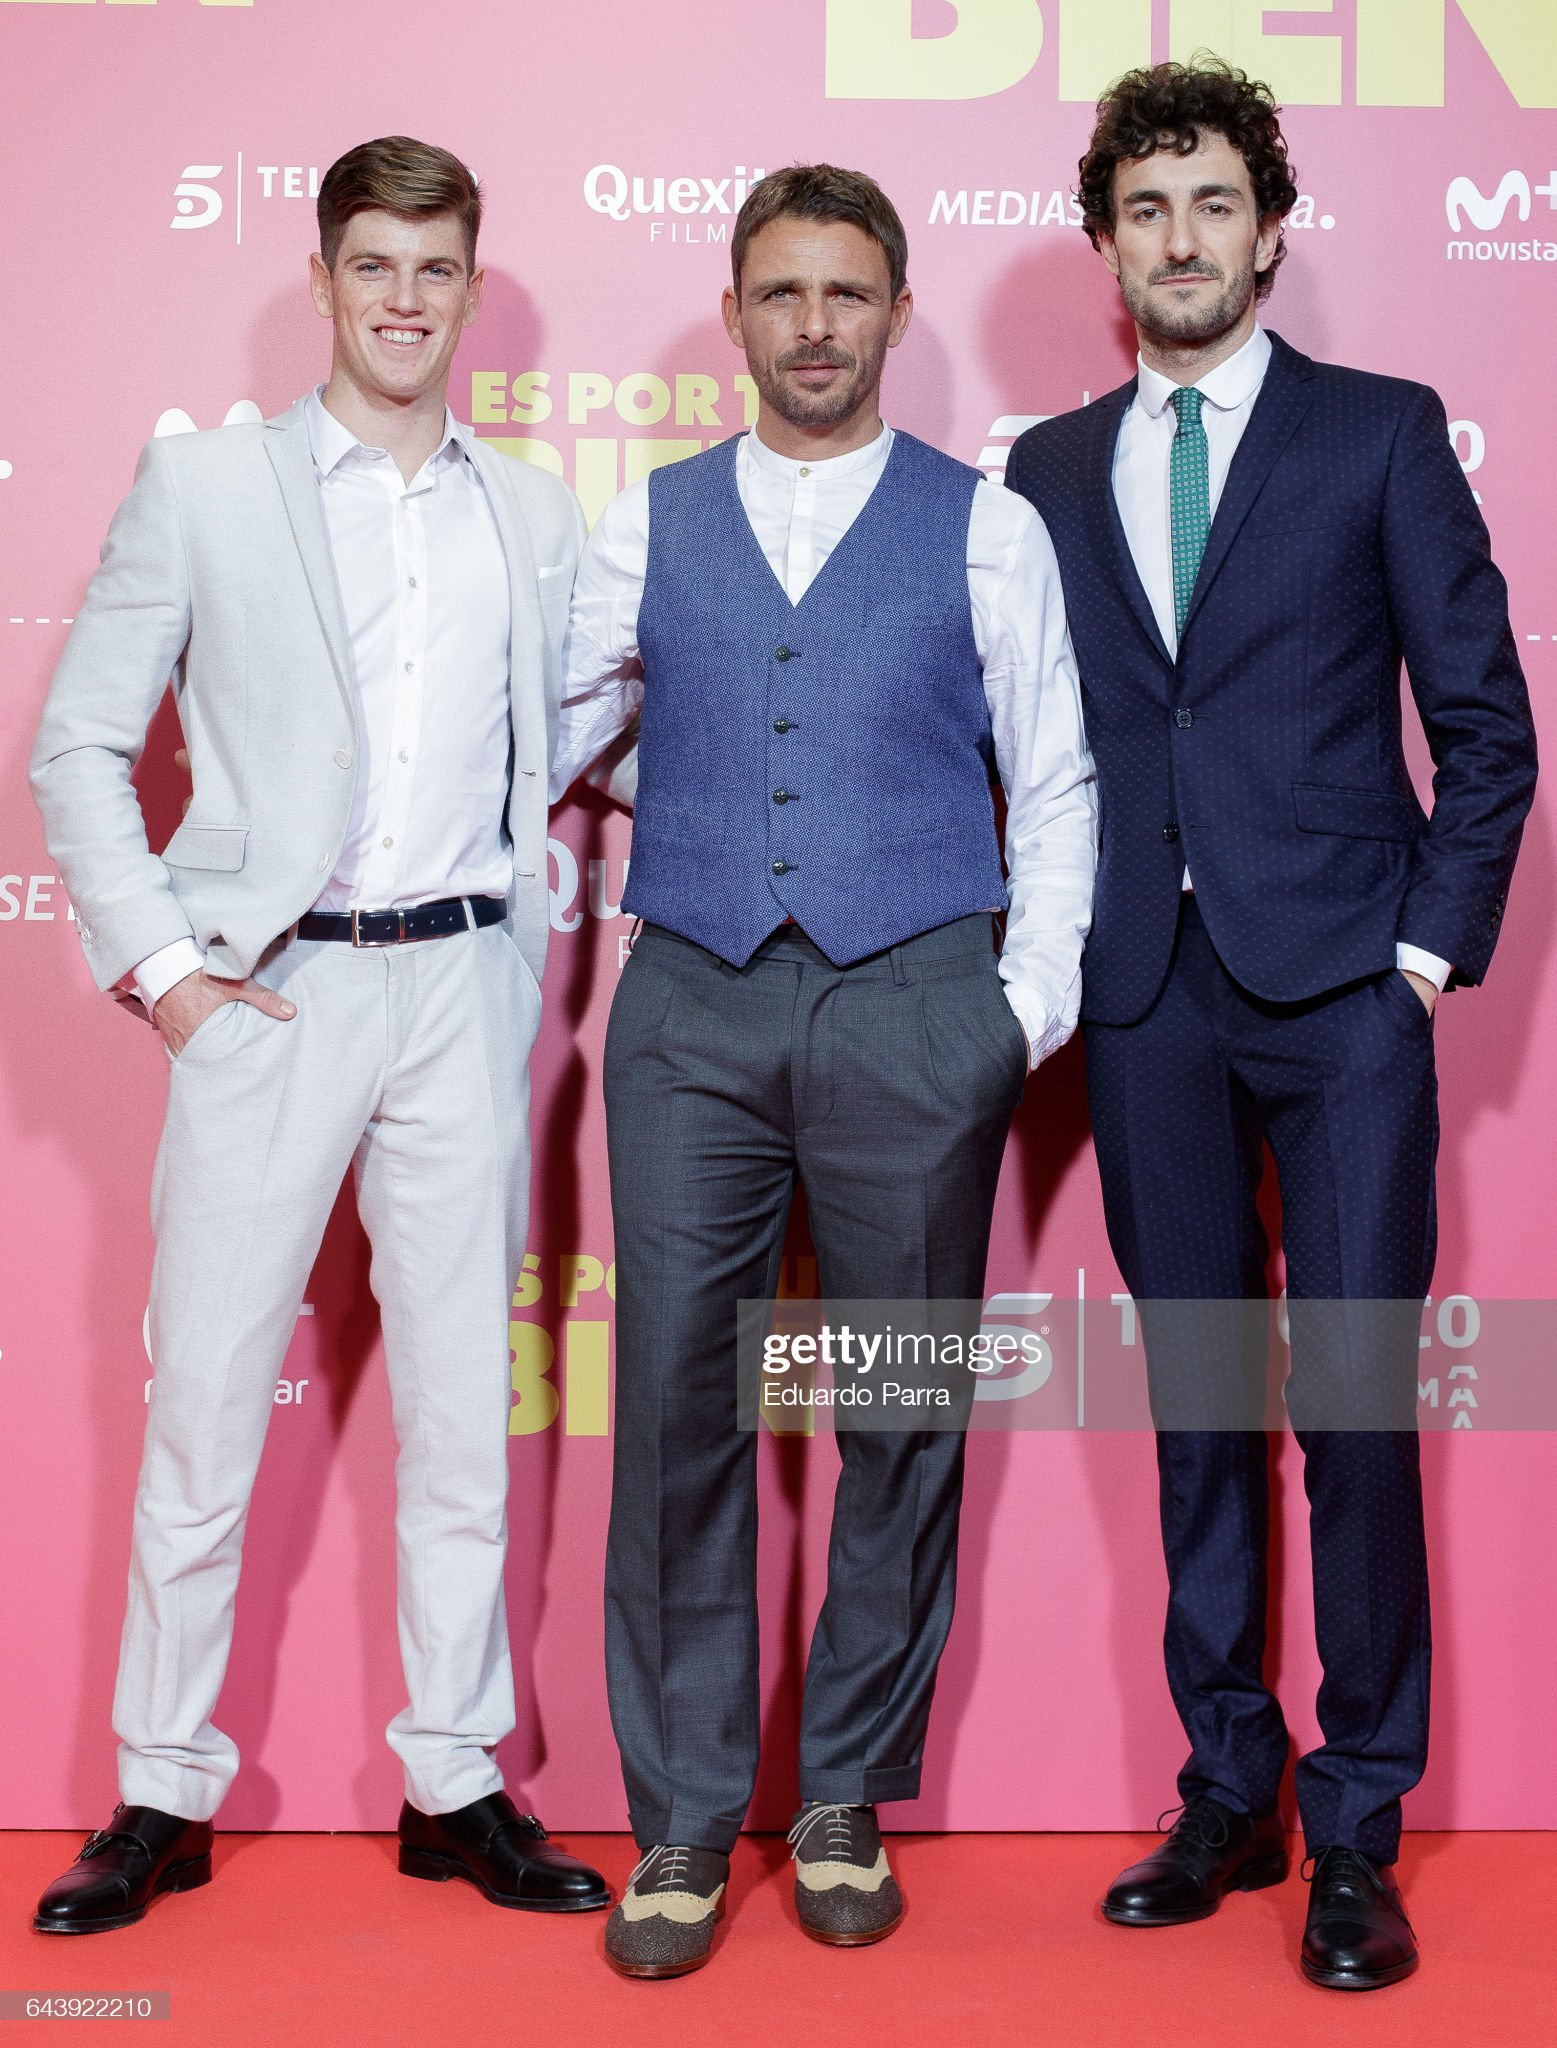 ¿Cuánto mide Miguel Bernardeau?  - Altura: 1,79 Actor-miguel-bernardeau-duato-luis-mottola-and-miki-esparbe-attend-picture-id643922210?s=2048x2048